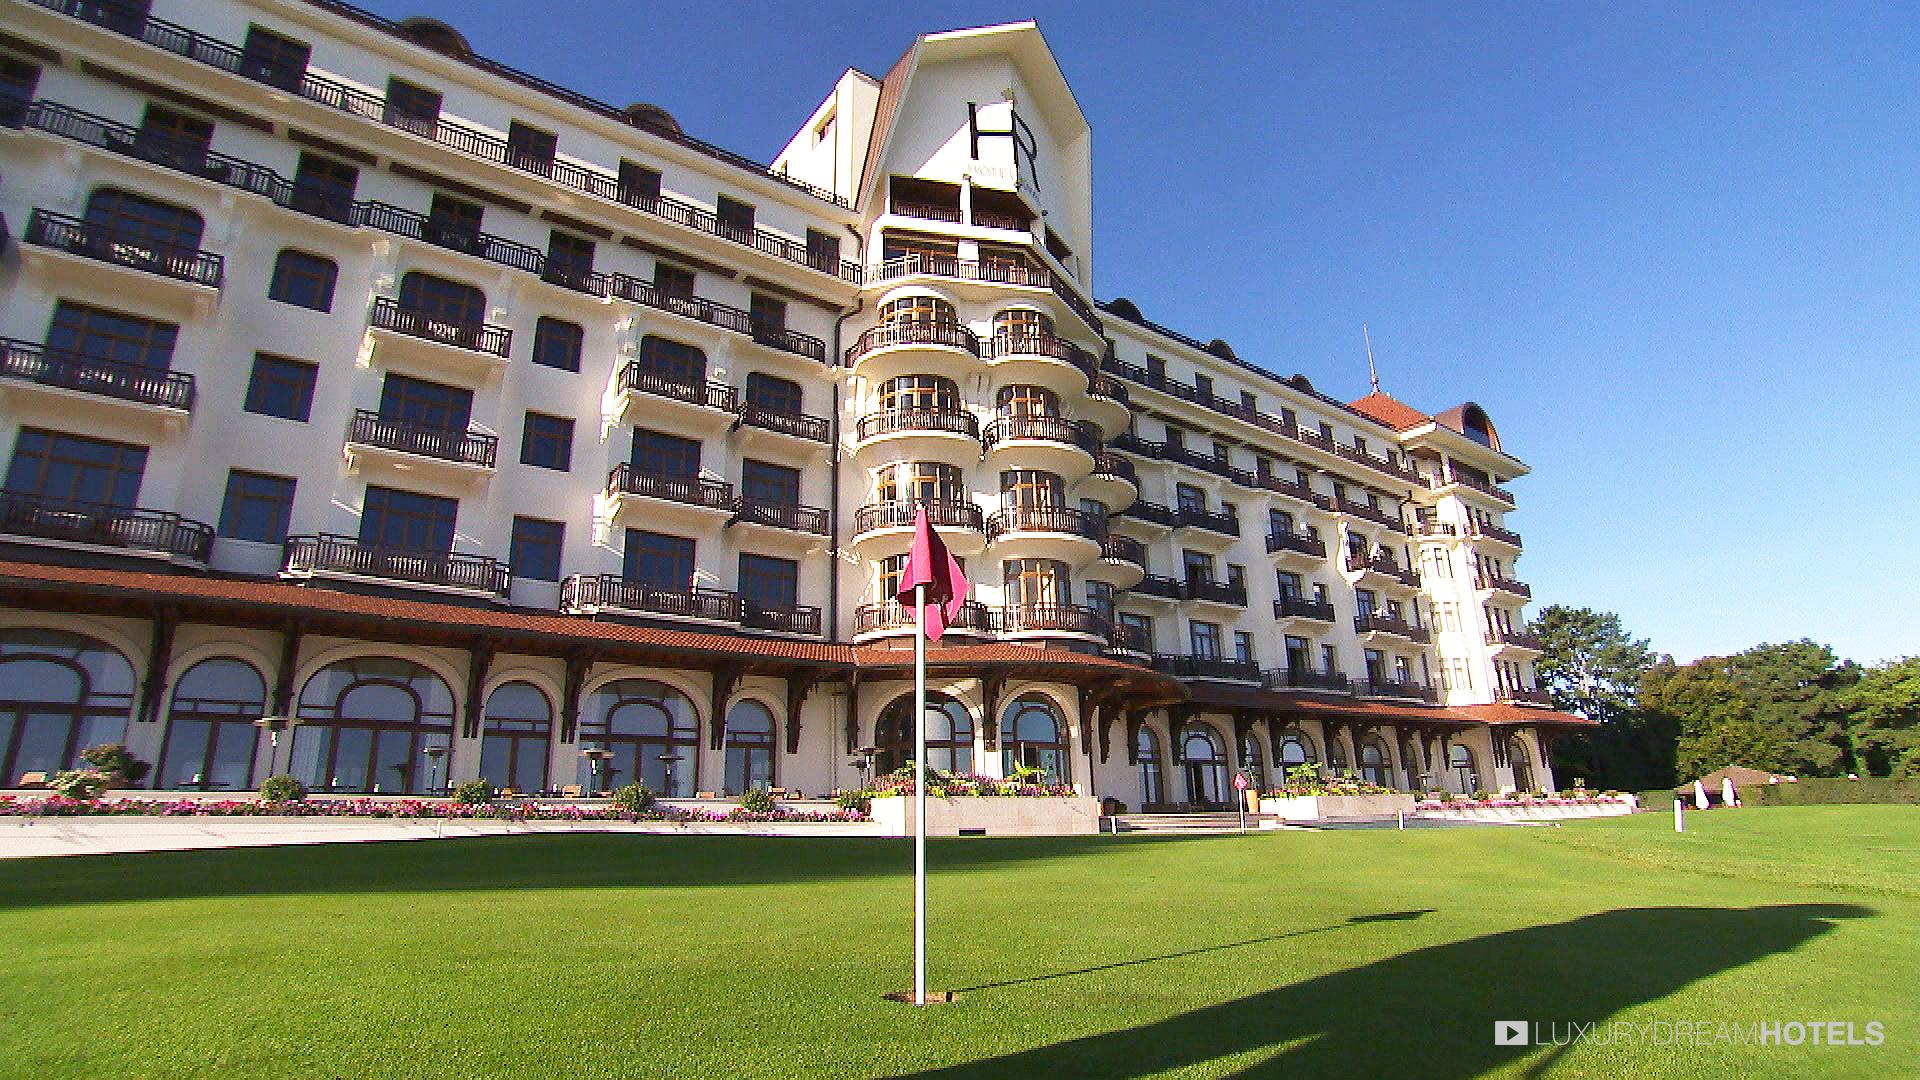 Luxury Hotel Royal Evian Resort Les Bains France Dream Hotels